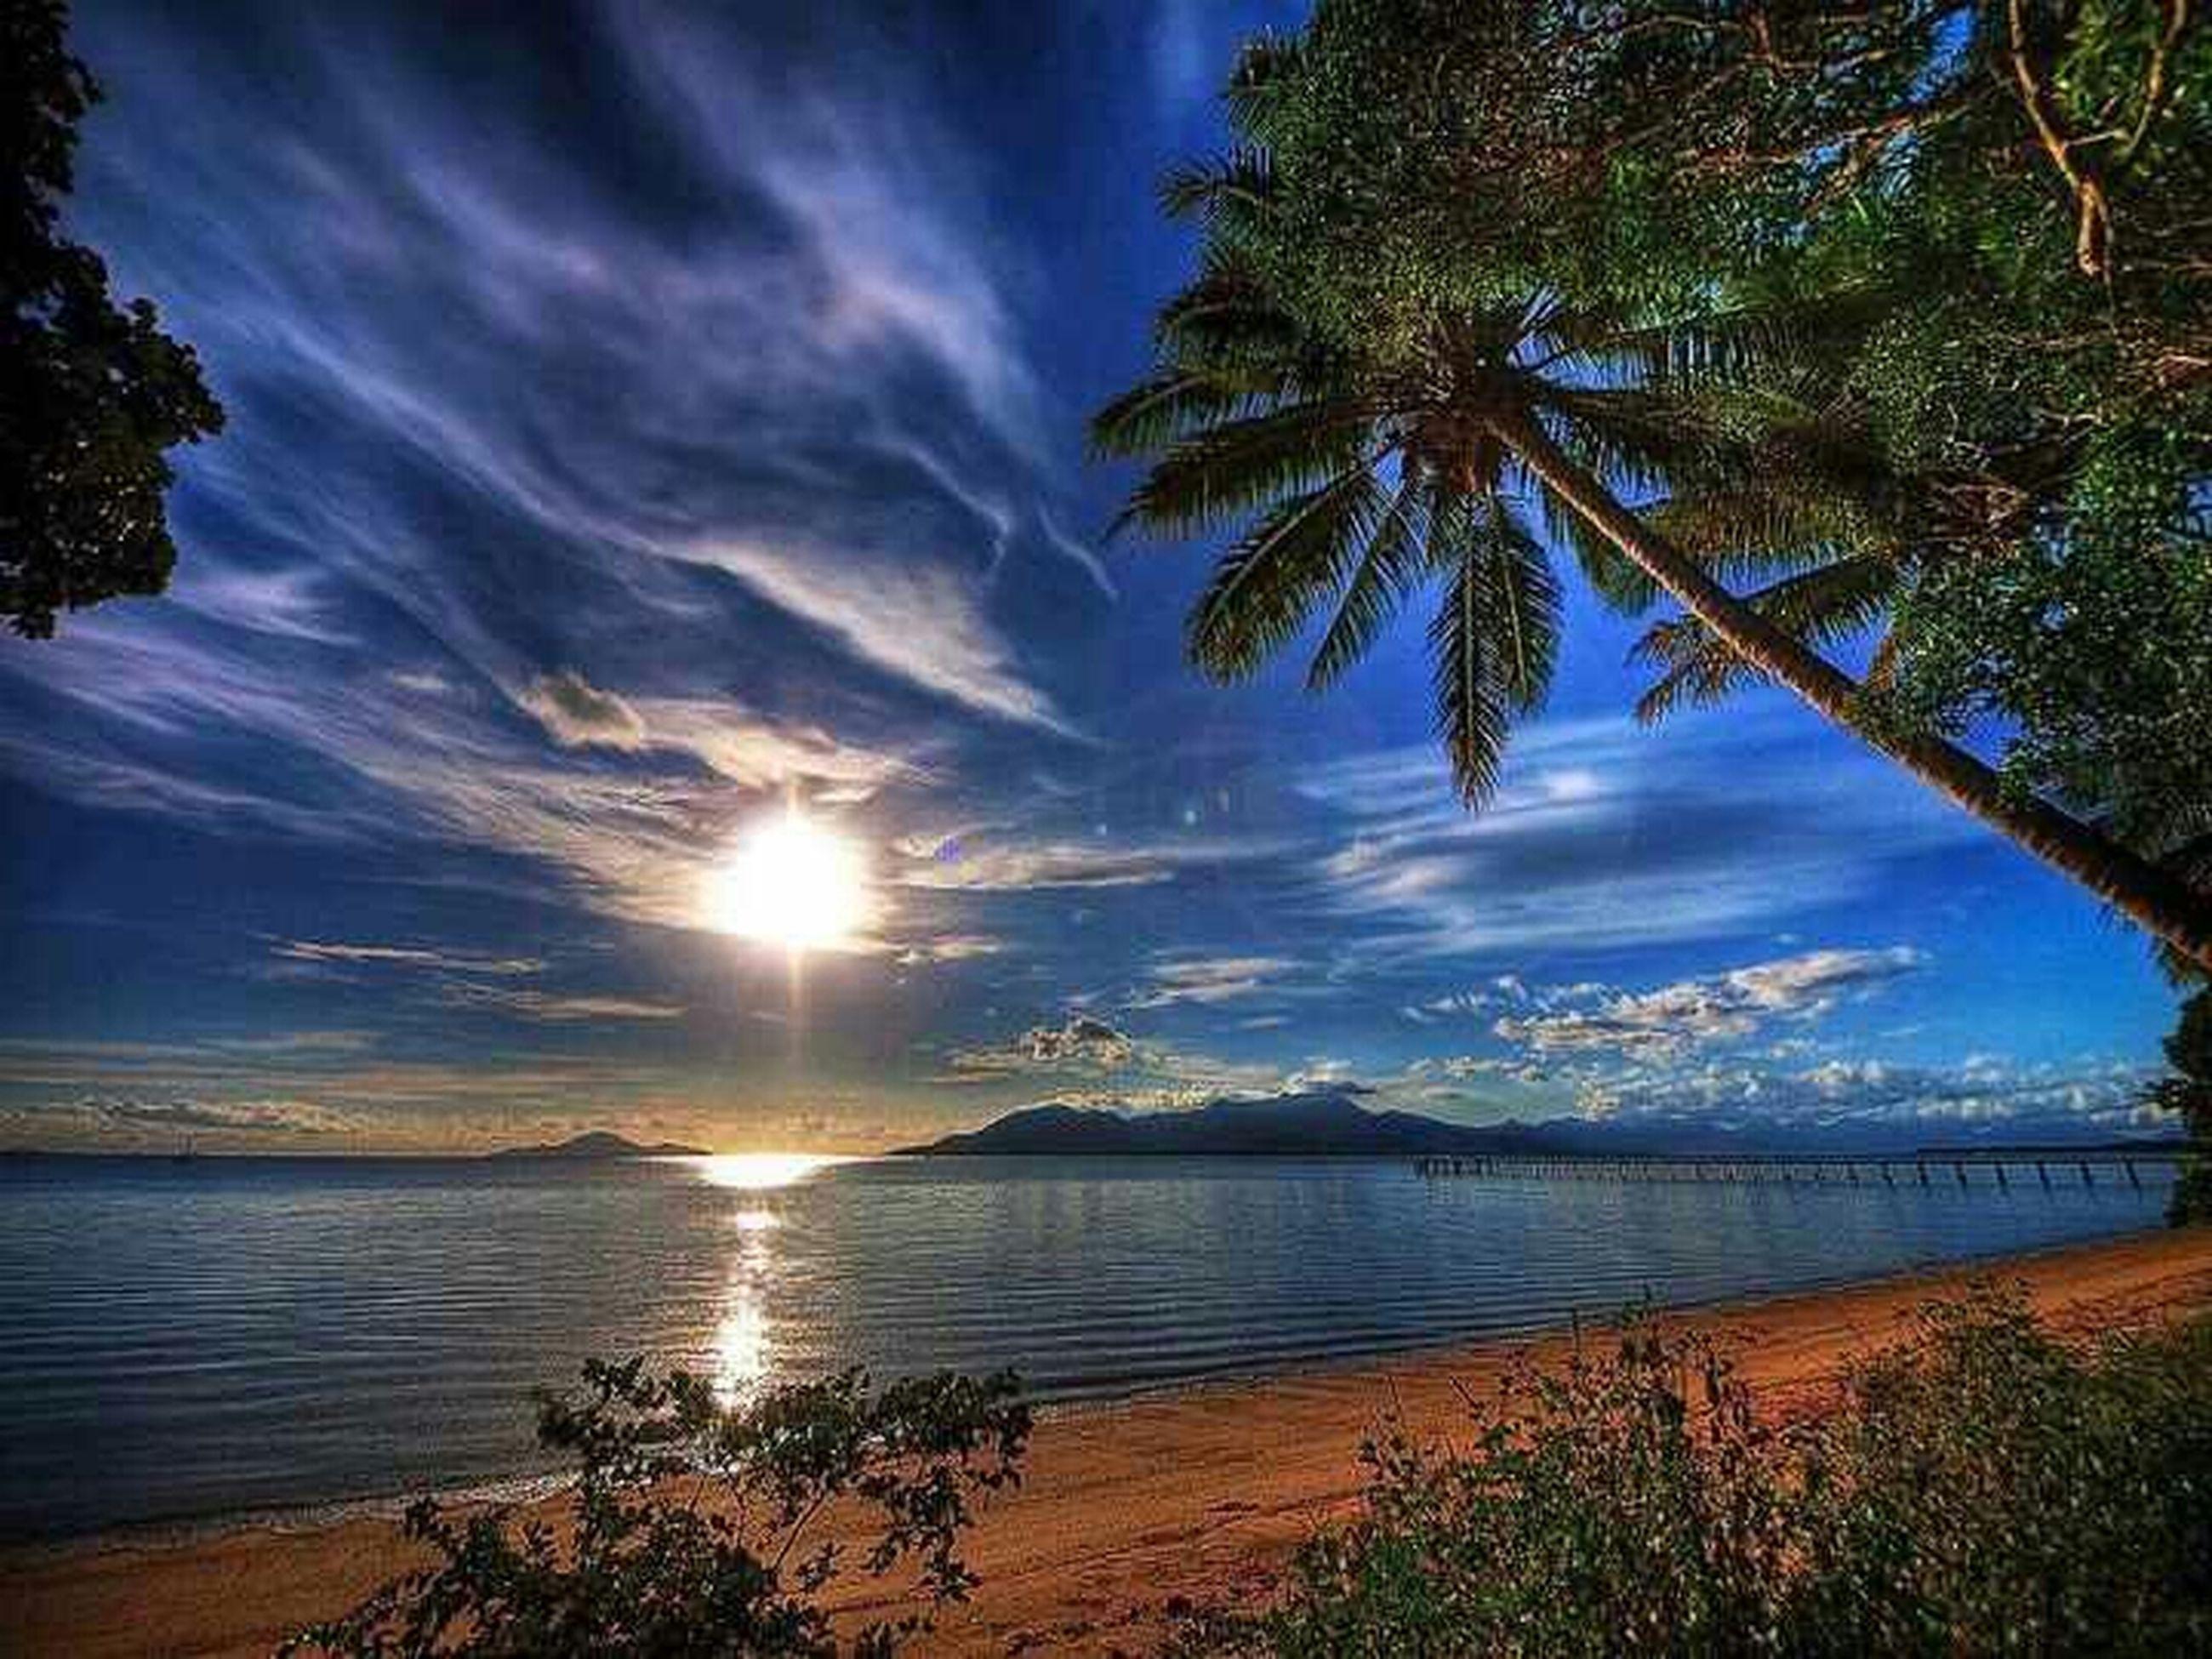 tranquil scene, tranquility, scenics, sky, water, beauty in nature, sea, tree, beach, nature, cloud - sky, sun, horizon over water, sunlight, palm tree, idyllic, shore, sunbeam, cloud, sunset